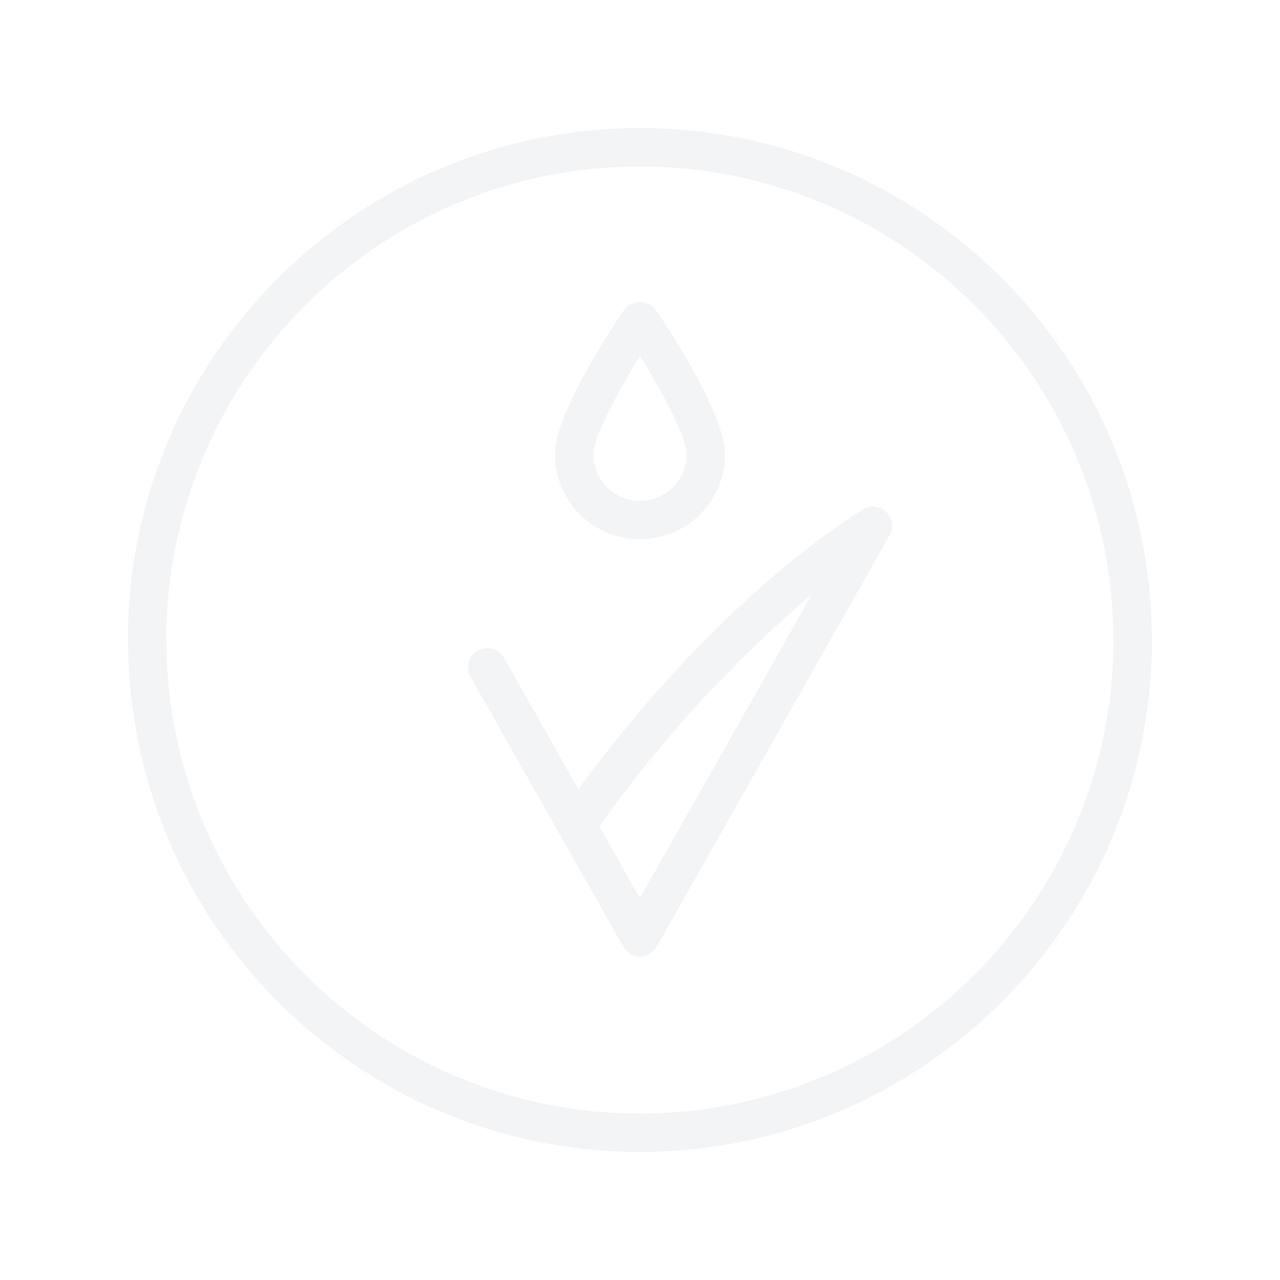 dc264969988a3 Tag Chanel Chance Eau Tendre Tuoksu — waldon.protese-de-silicone.info